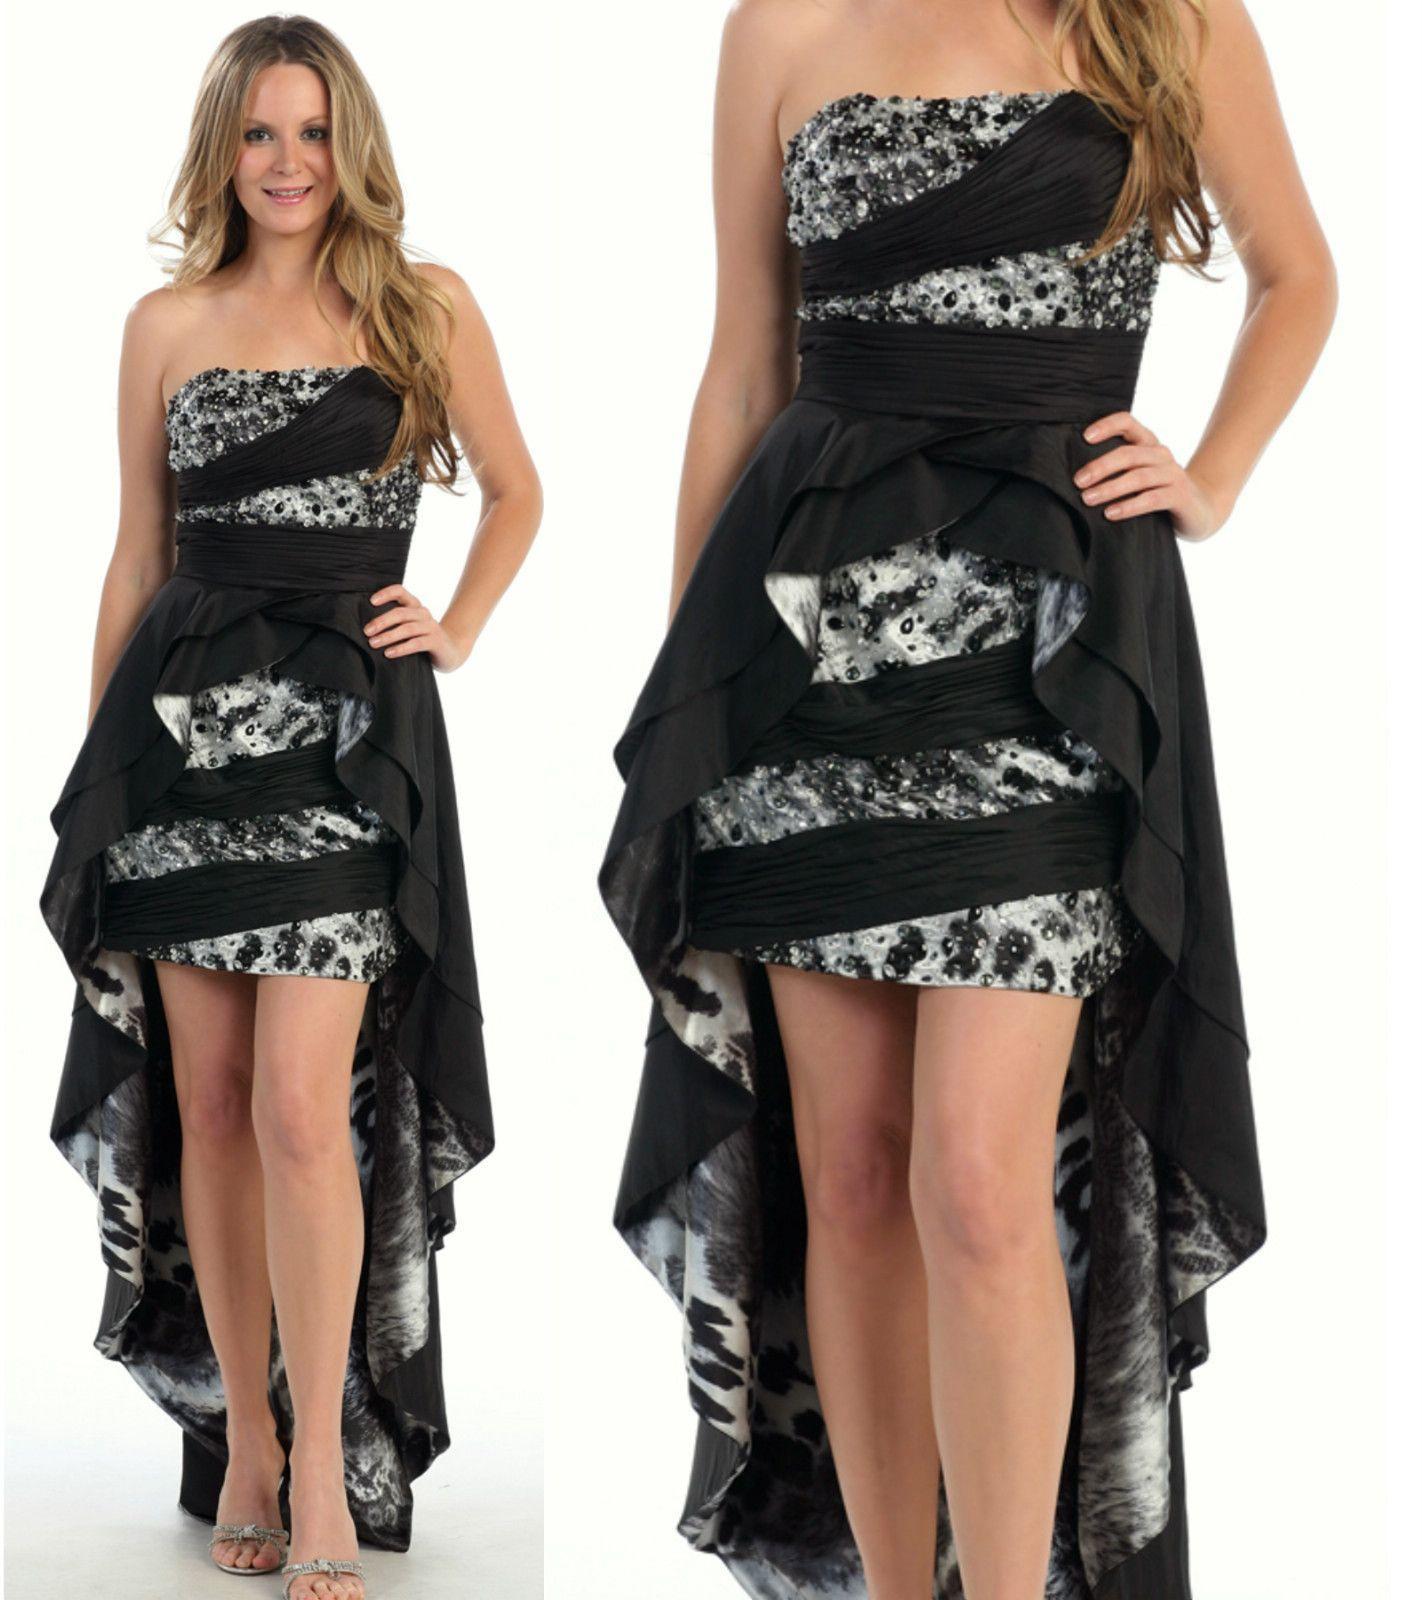 Promdressshortinfrontlonginbackg homecoming dresses